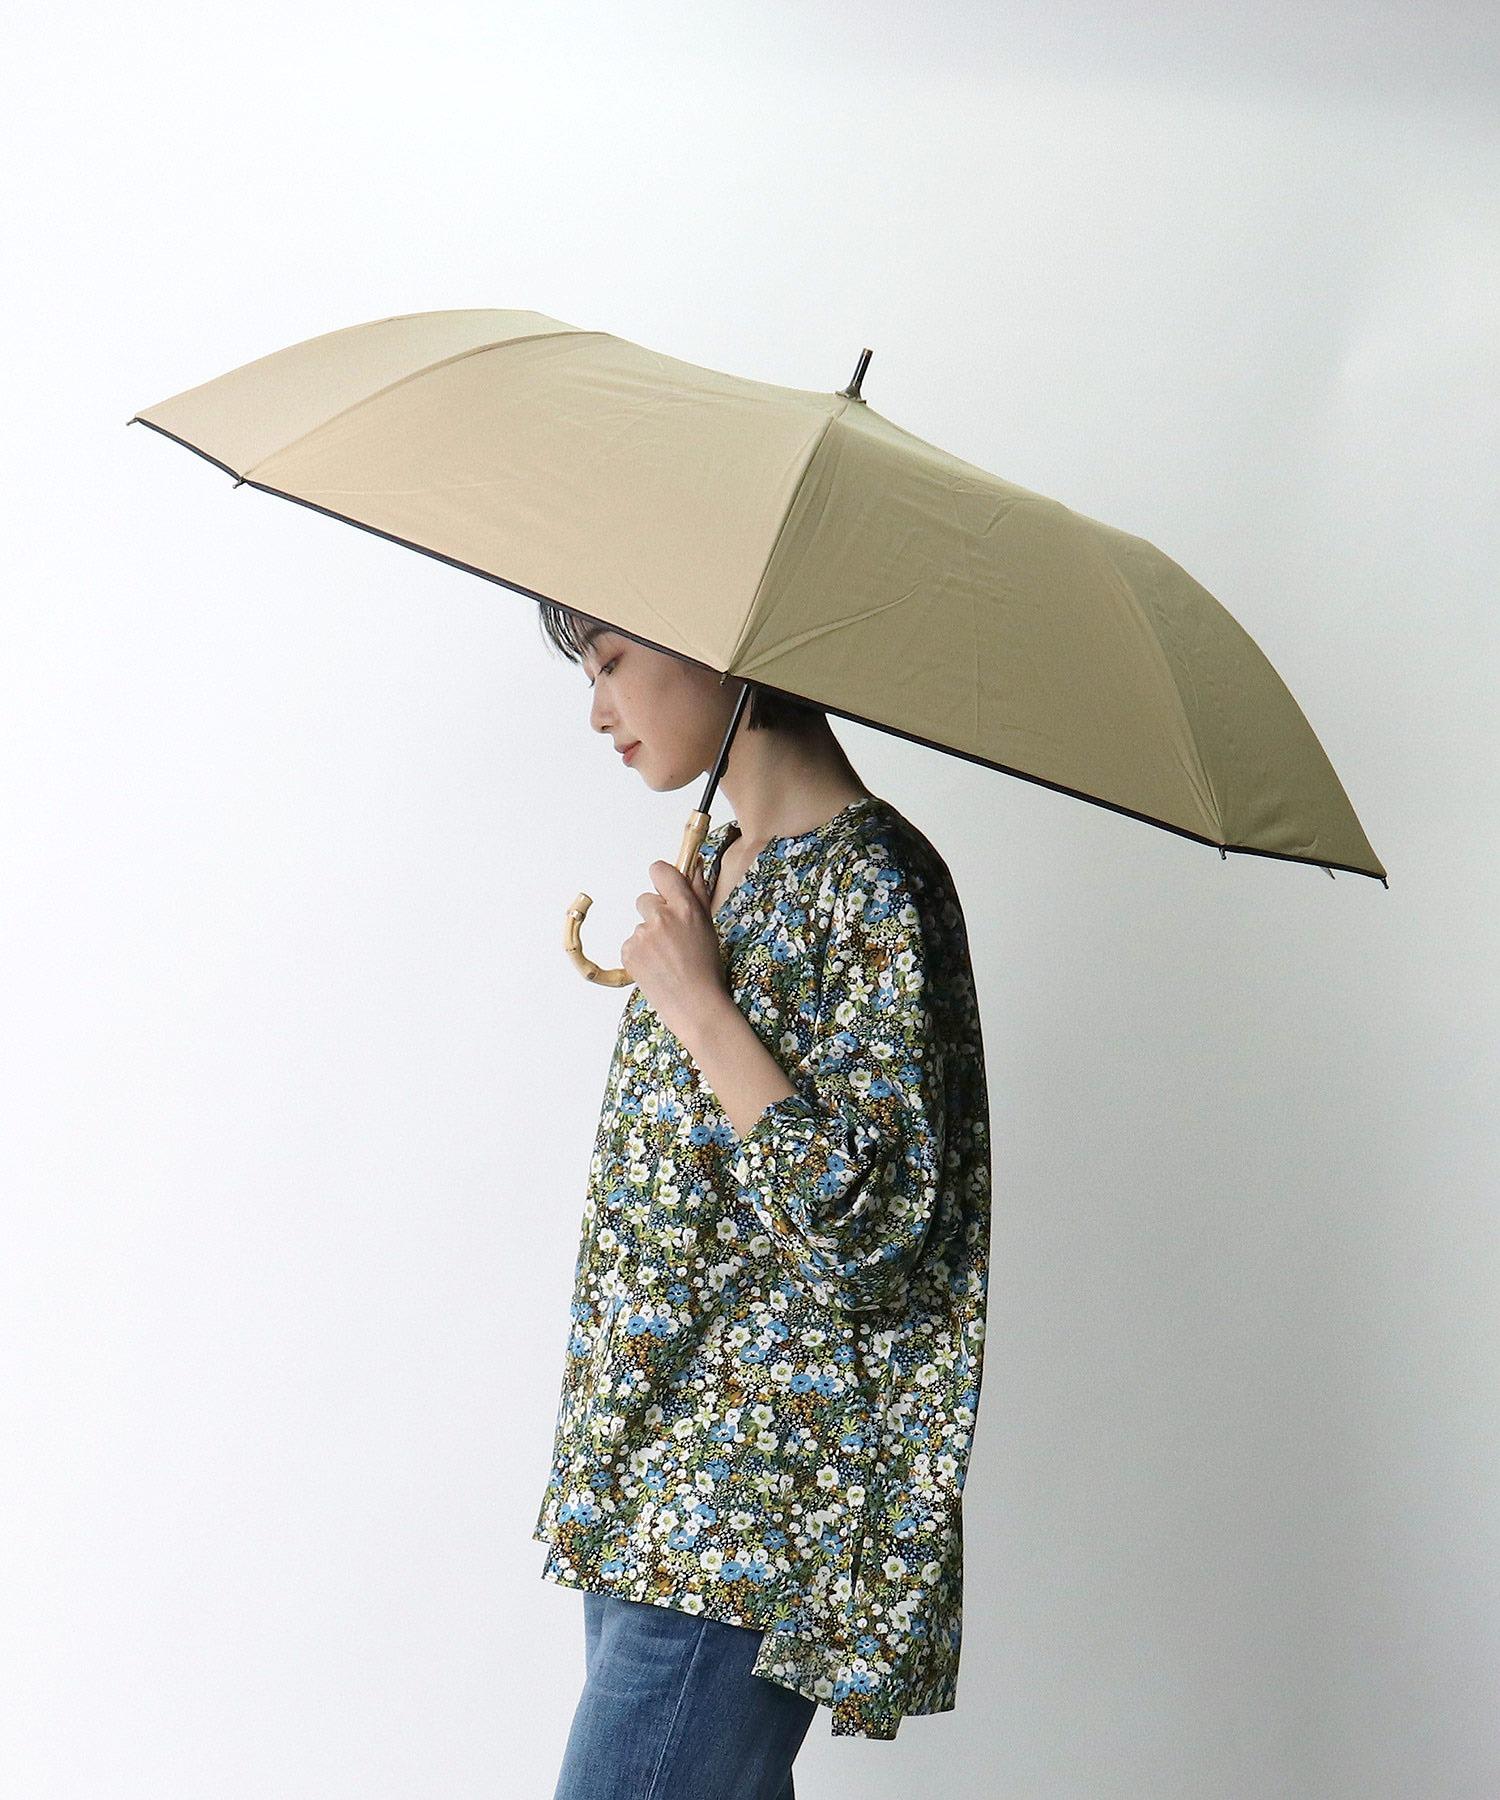 C/Cムジ裾パイピングショートワイド傘 27371